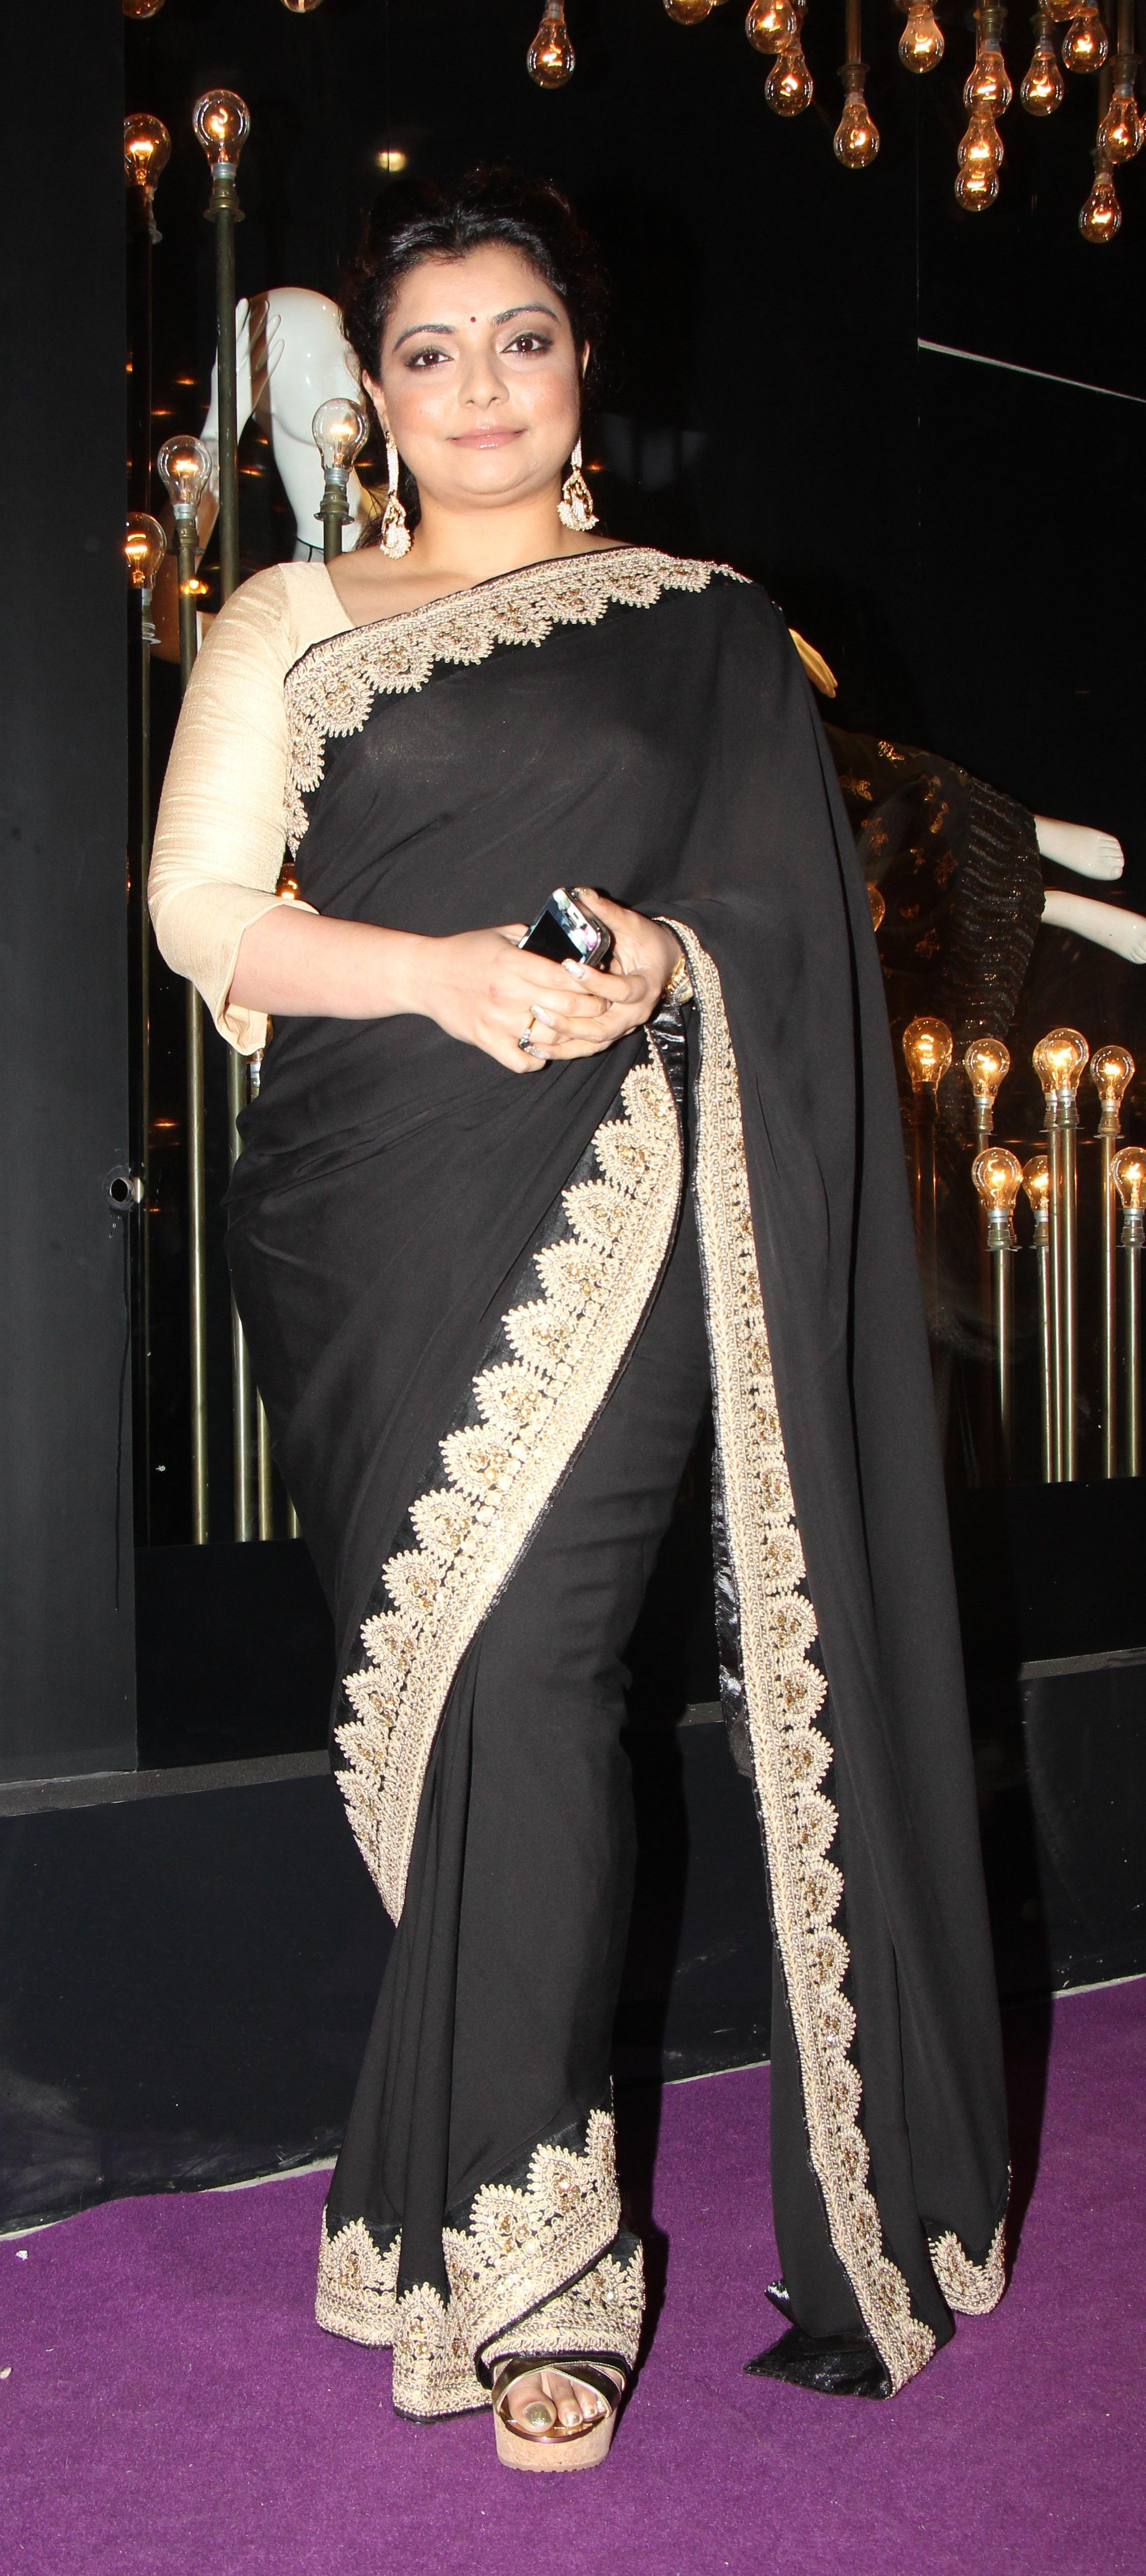 Vaibhavi Merchant